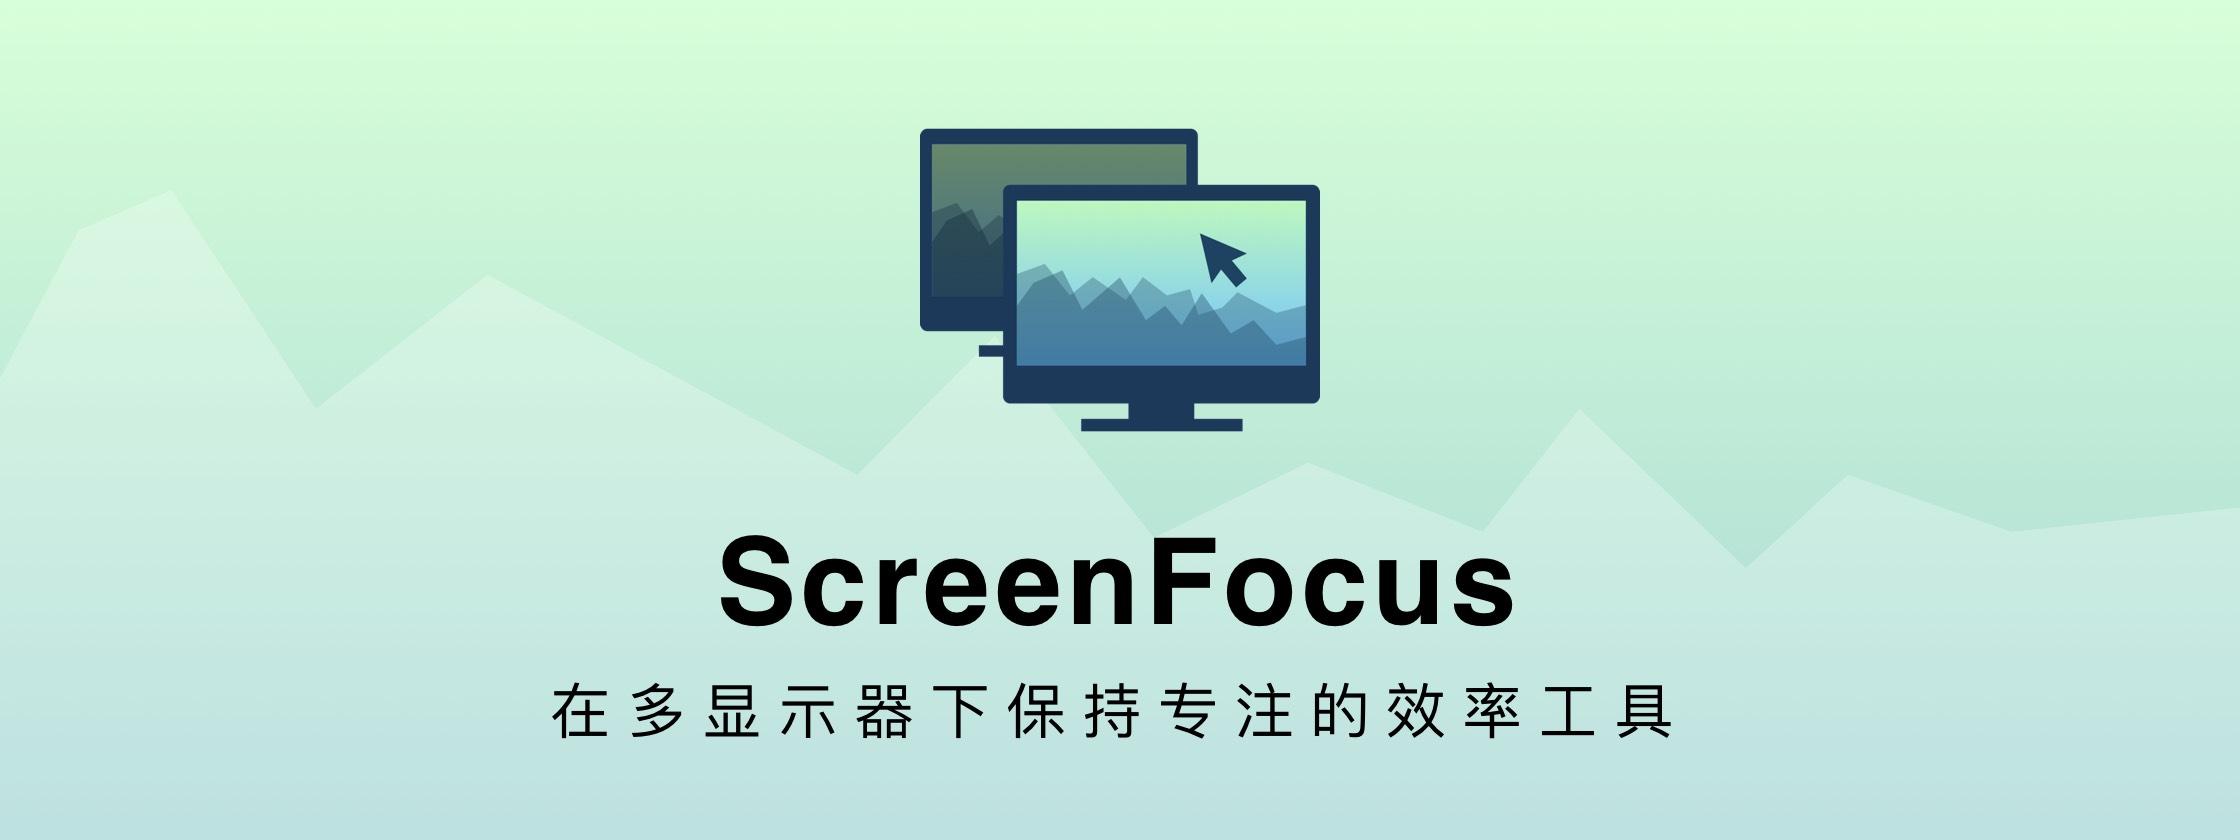 ScreenFocus,在多显示器下保持专注的效率工具